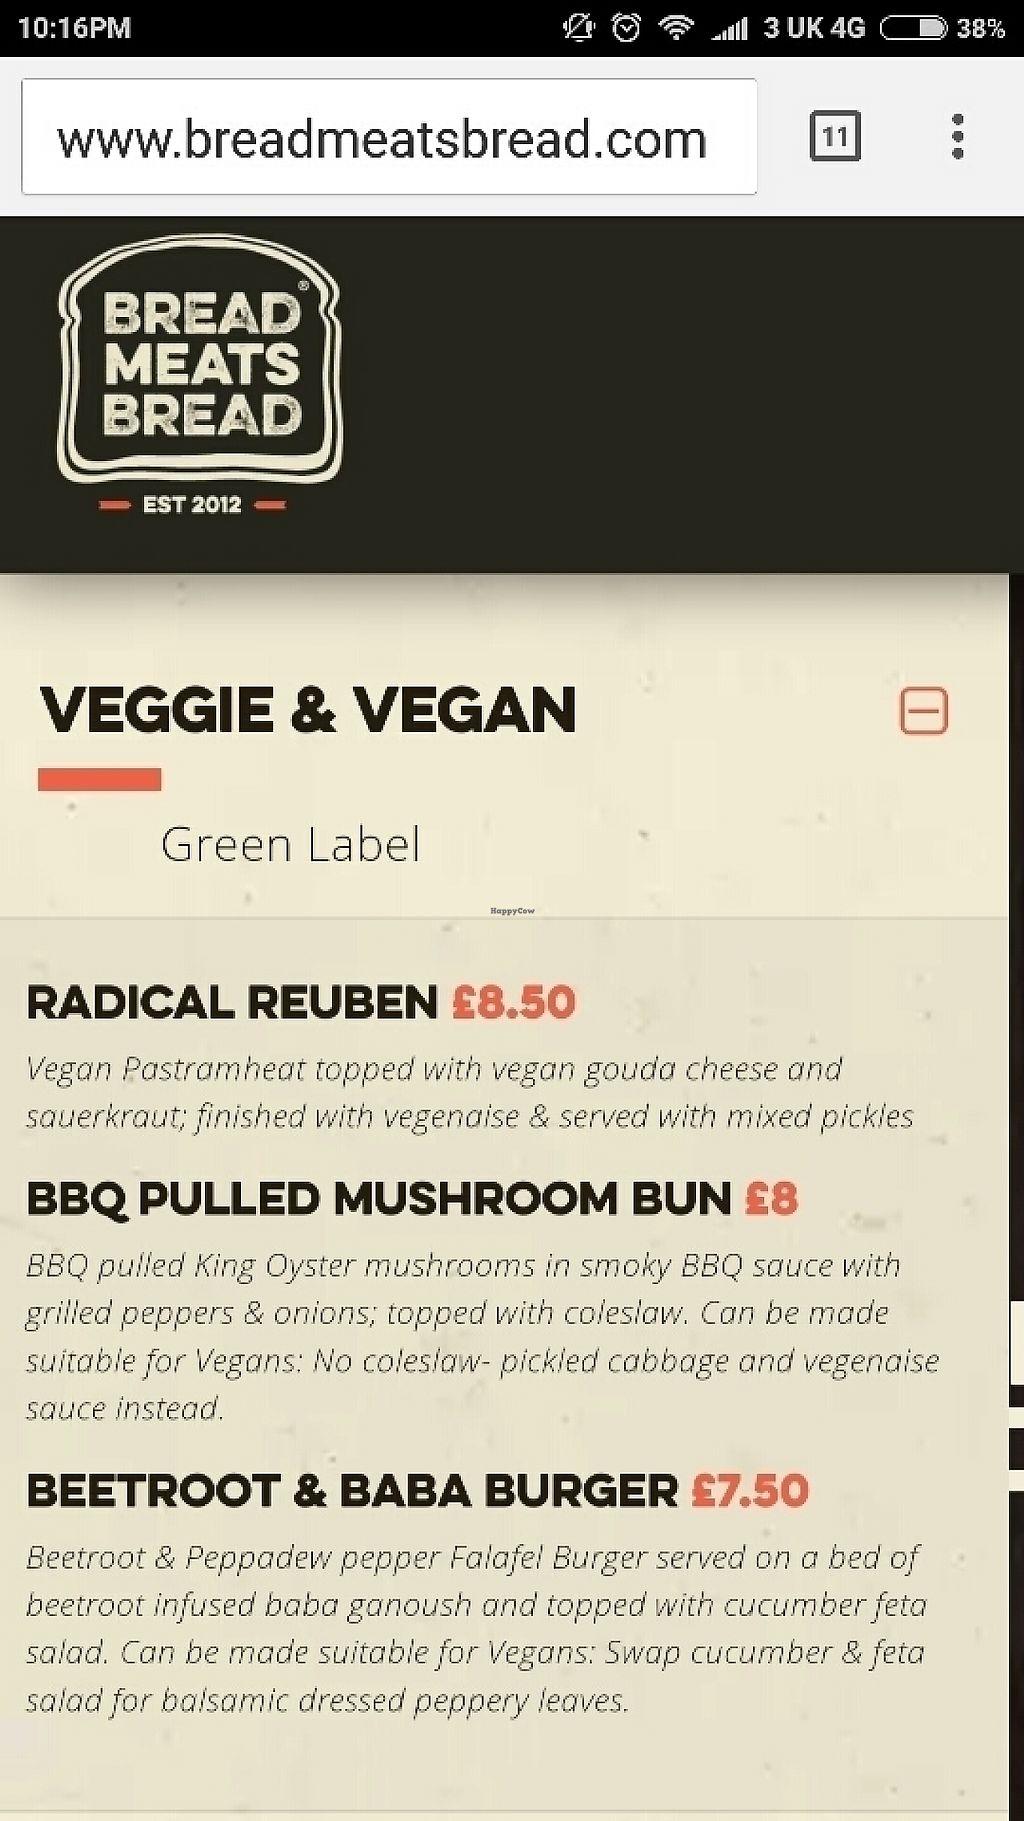 "Photo of Bread Meats Bread  by <a href=""/members/profile/d.vegan"">d.vegan</a> <br/>Vegan menu 2 <br/> June 1, 2017  - <a href='/contact/abuse/image/93198/264787'>Report</a>"